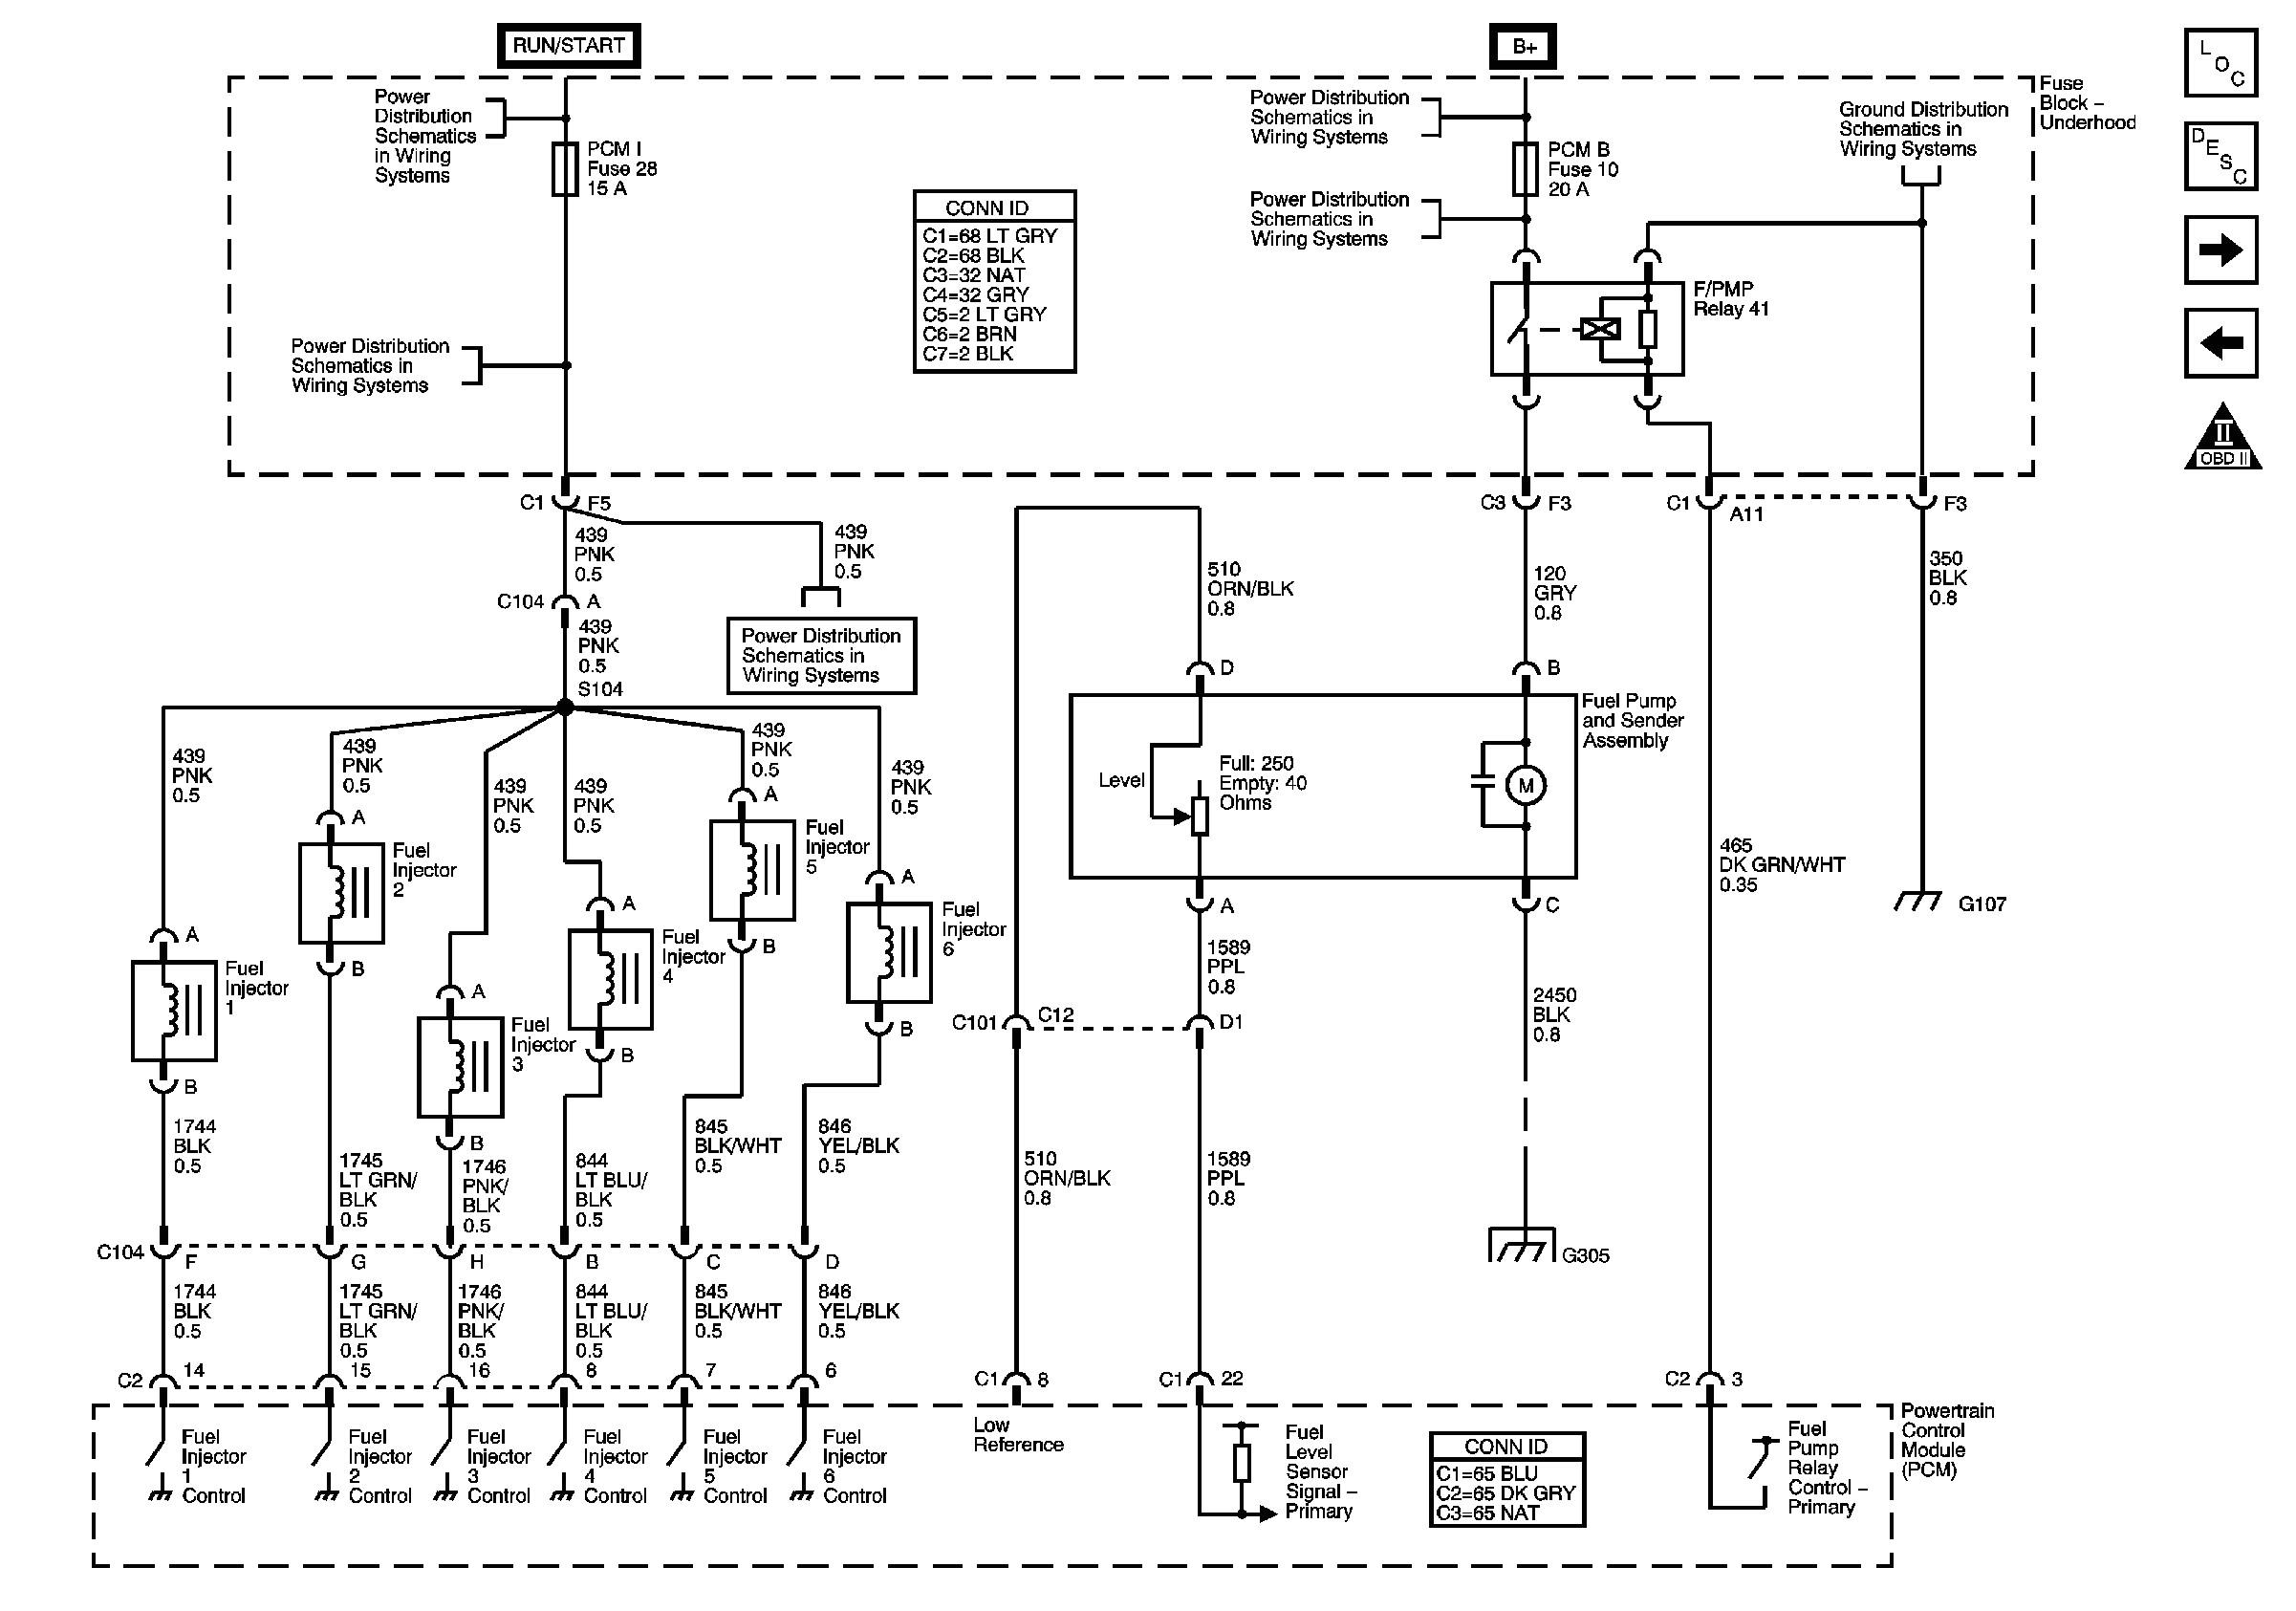 2003 chevy trailblazer wiring diagram rear just wiring diagram 2003 chevy trailblazer wiring diagram rear